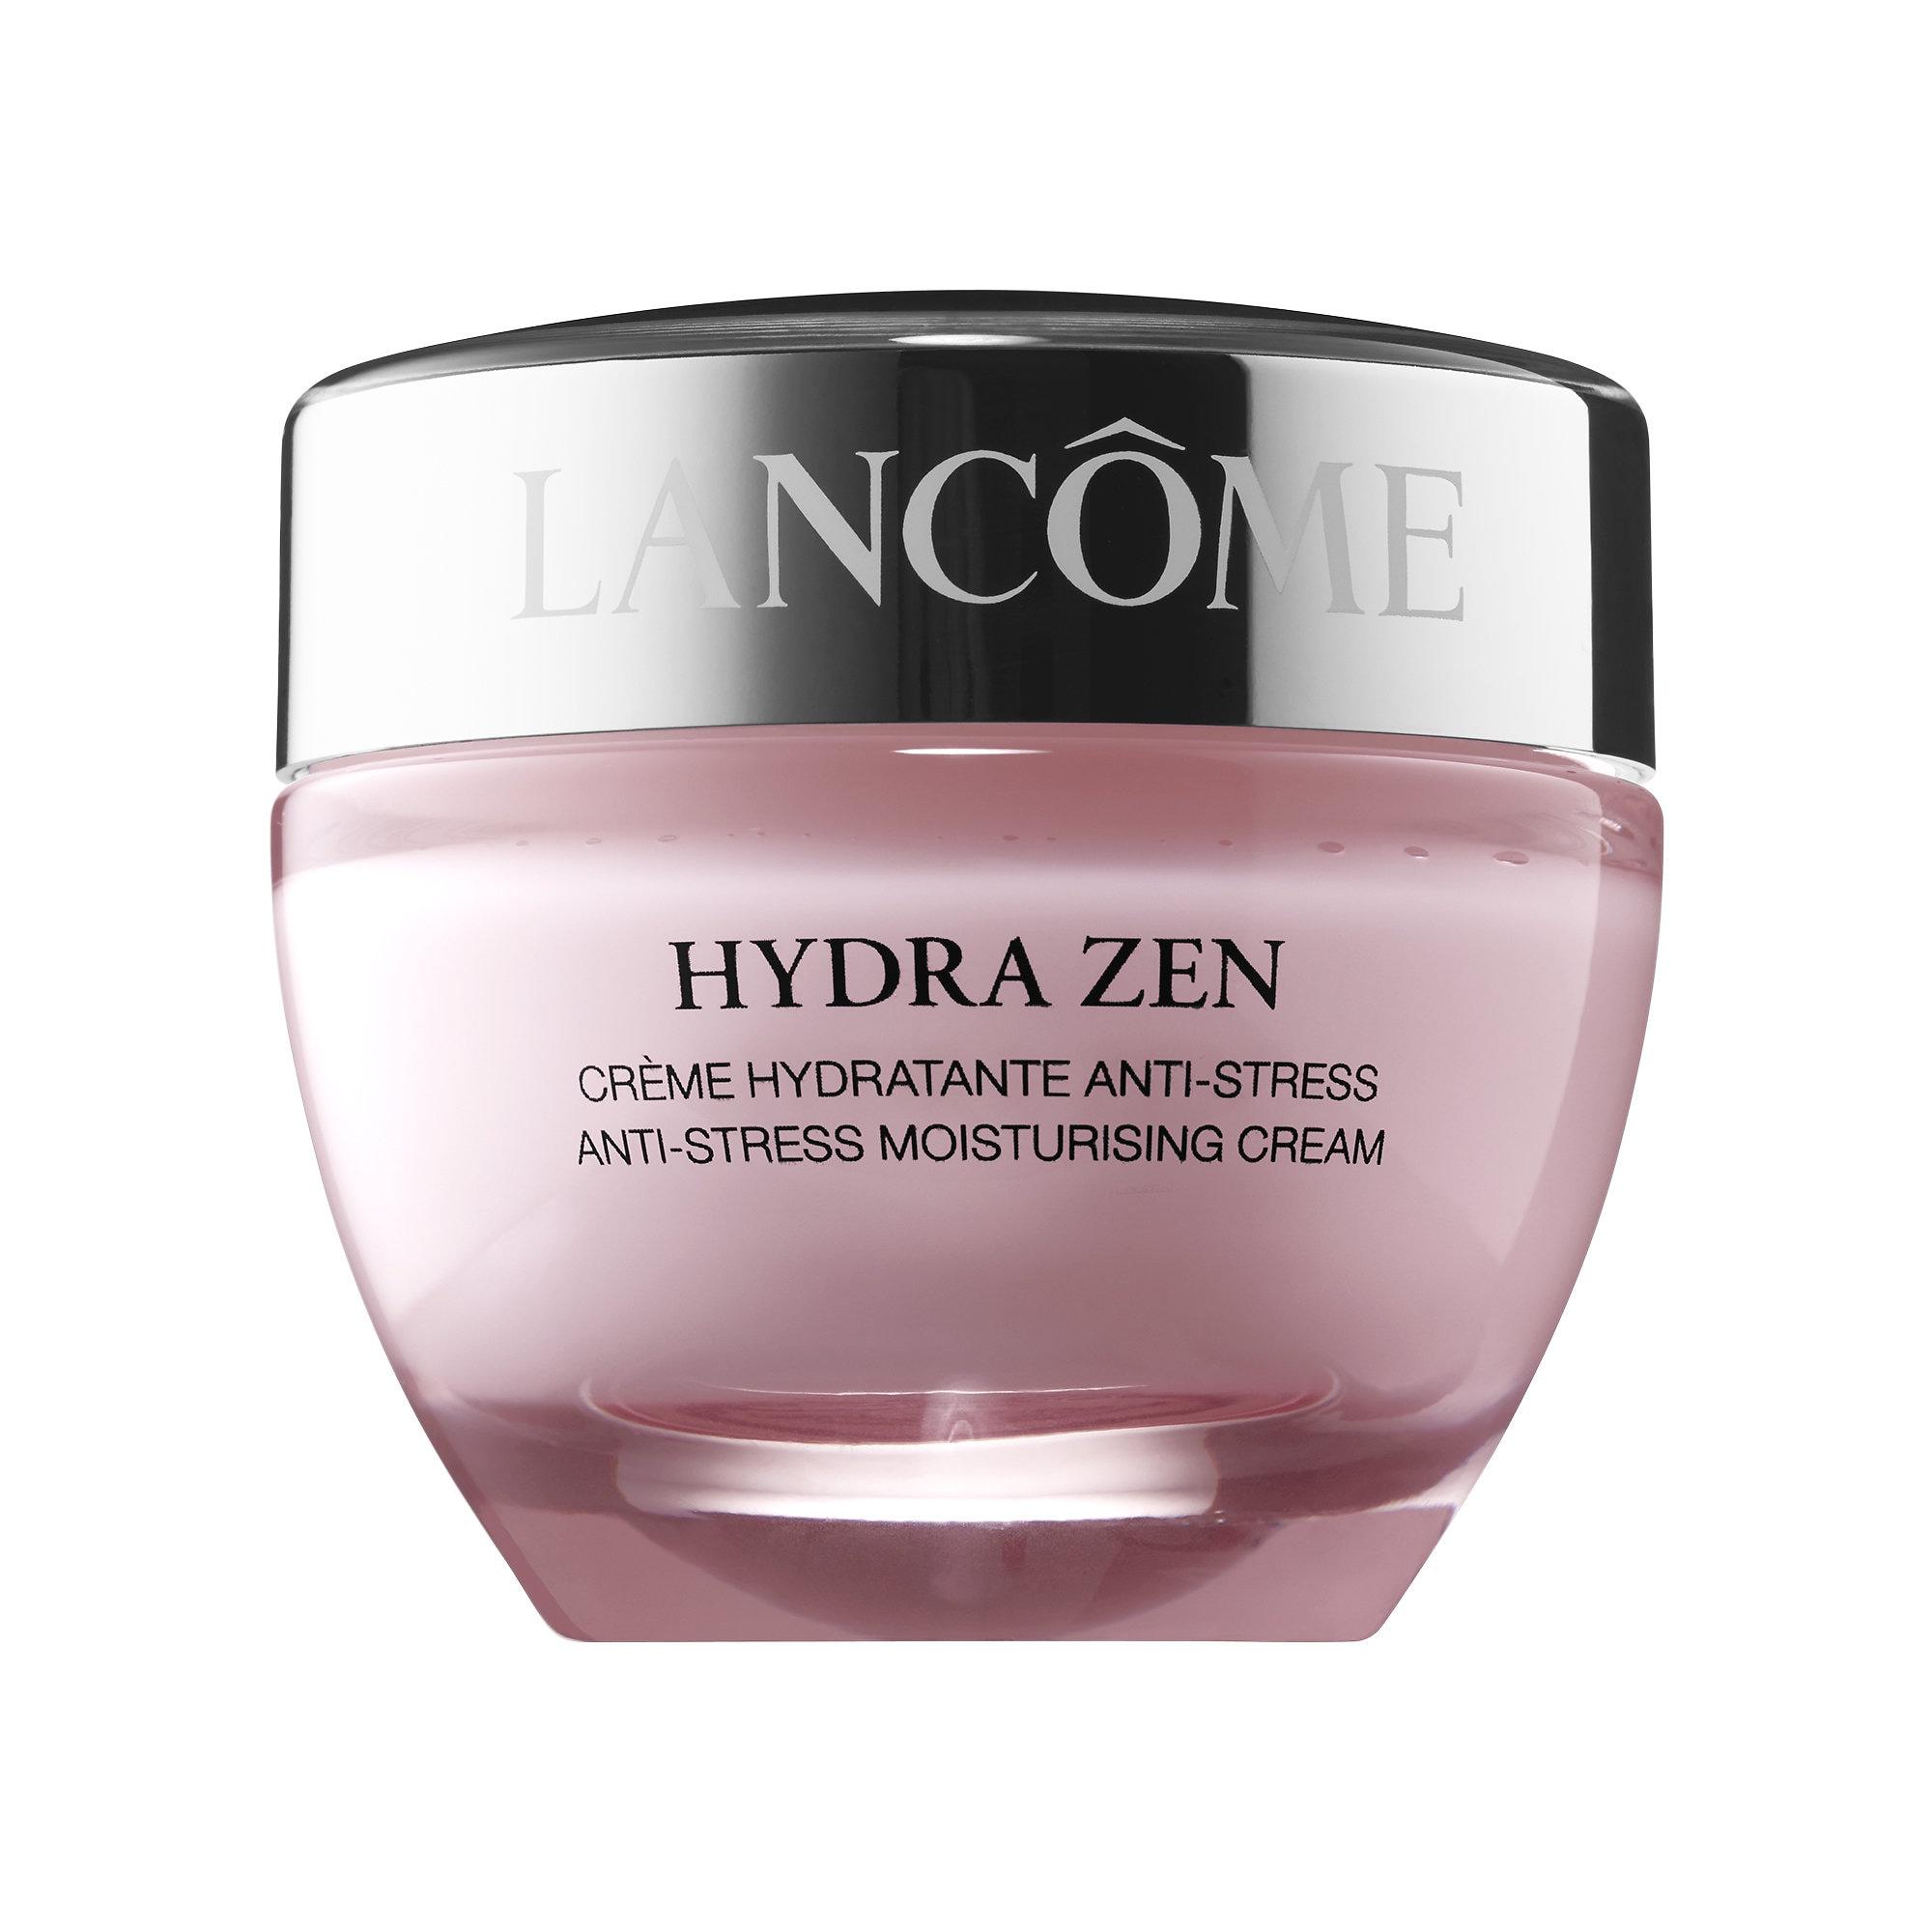 Lancome - Hydra Zen Anti-Stress Moisturizing Face Cream